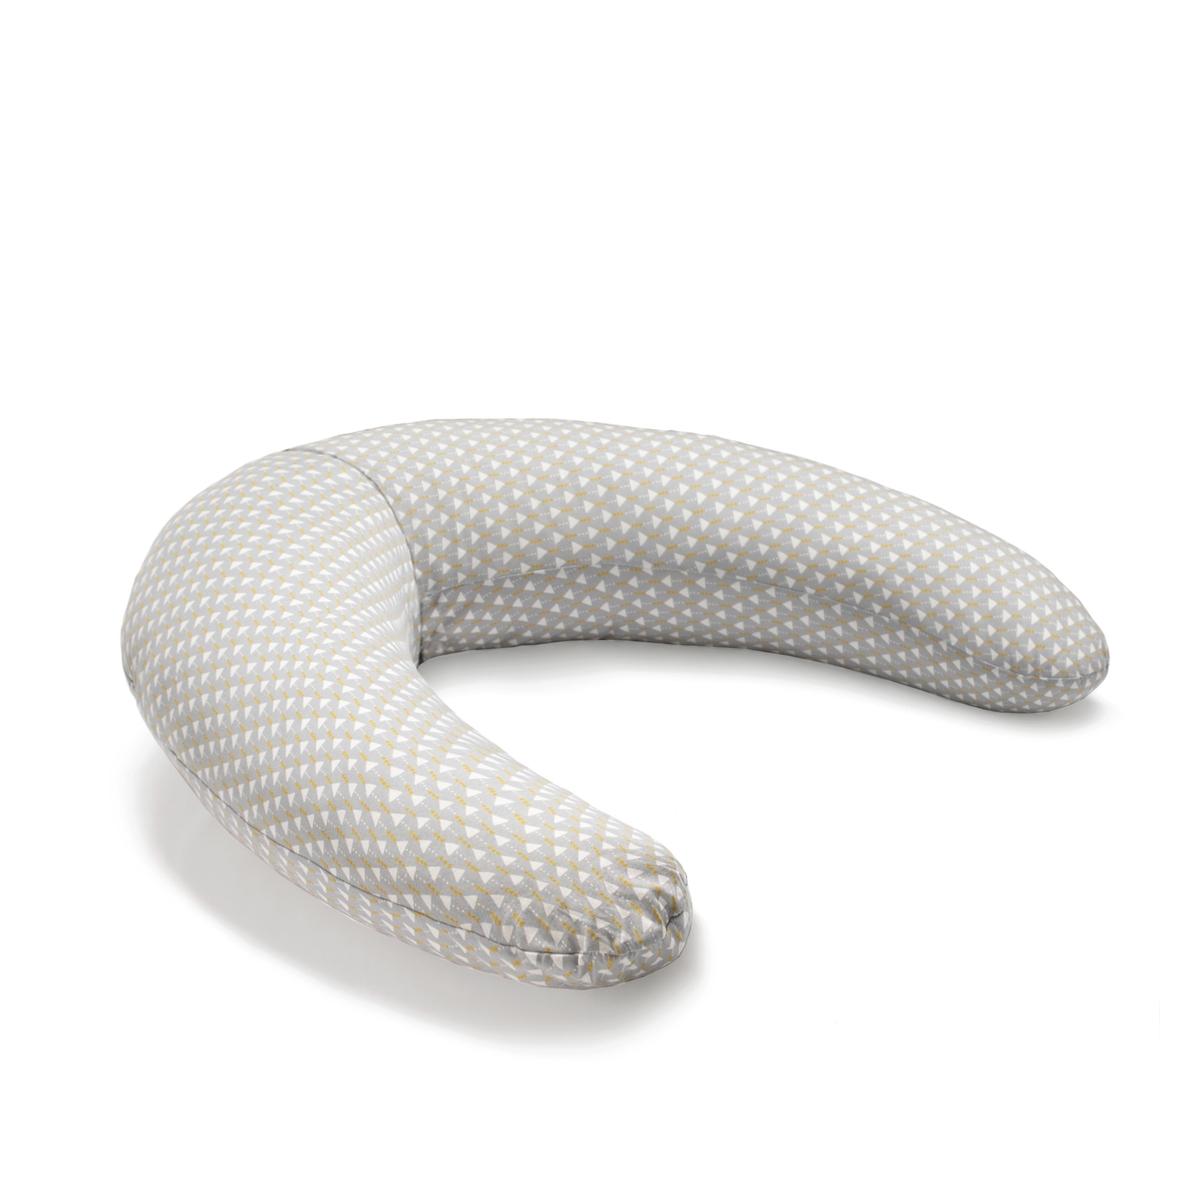 Подушка для грудного вскармливания